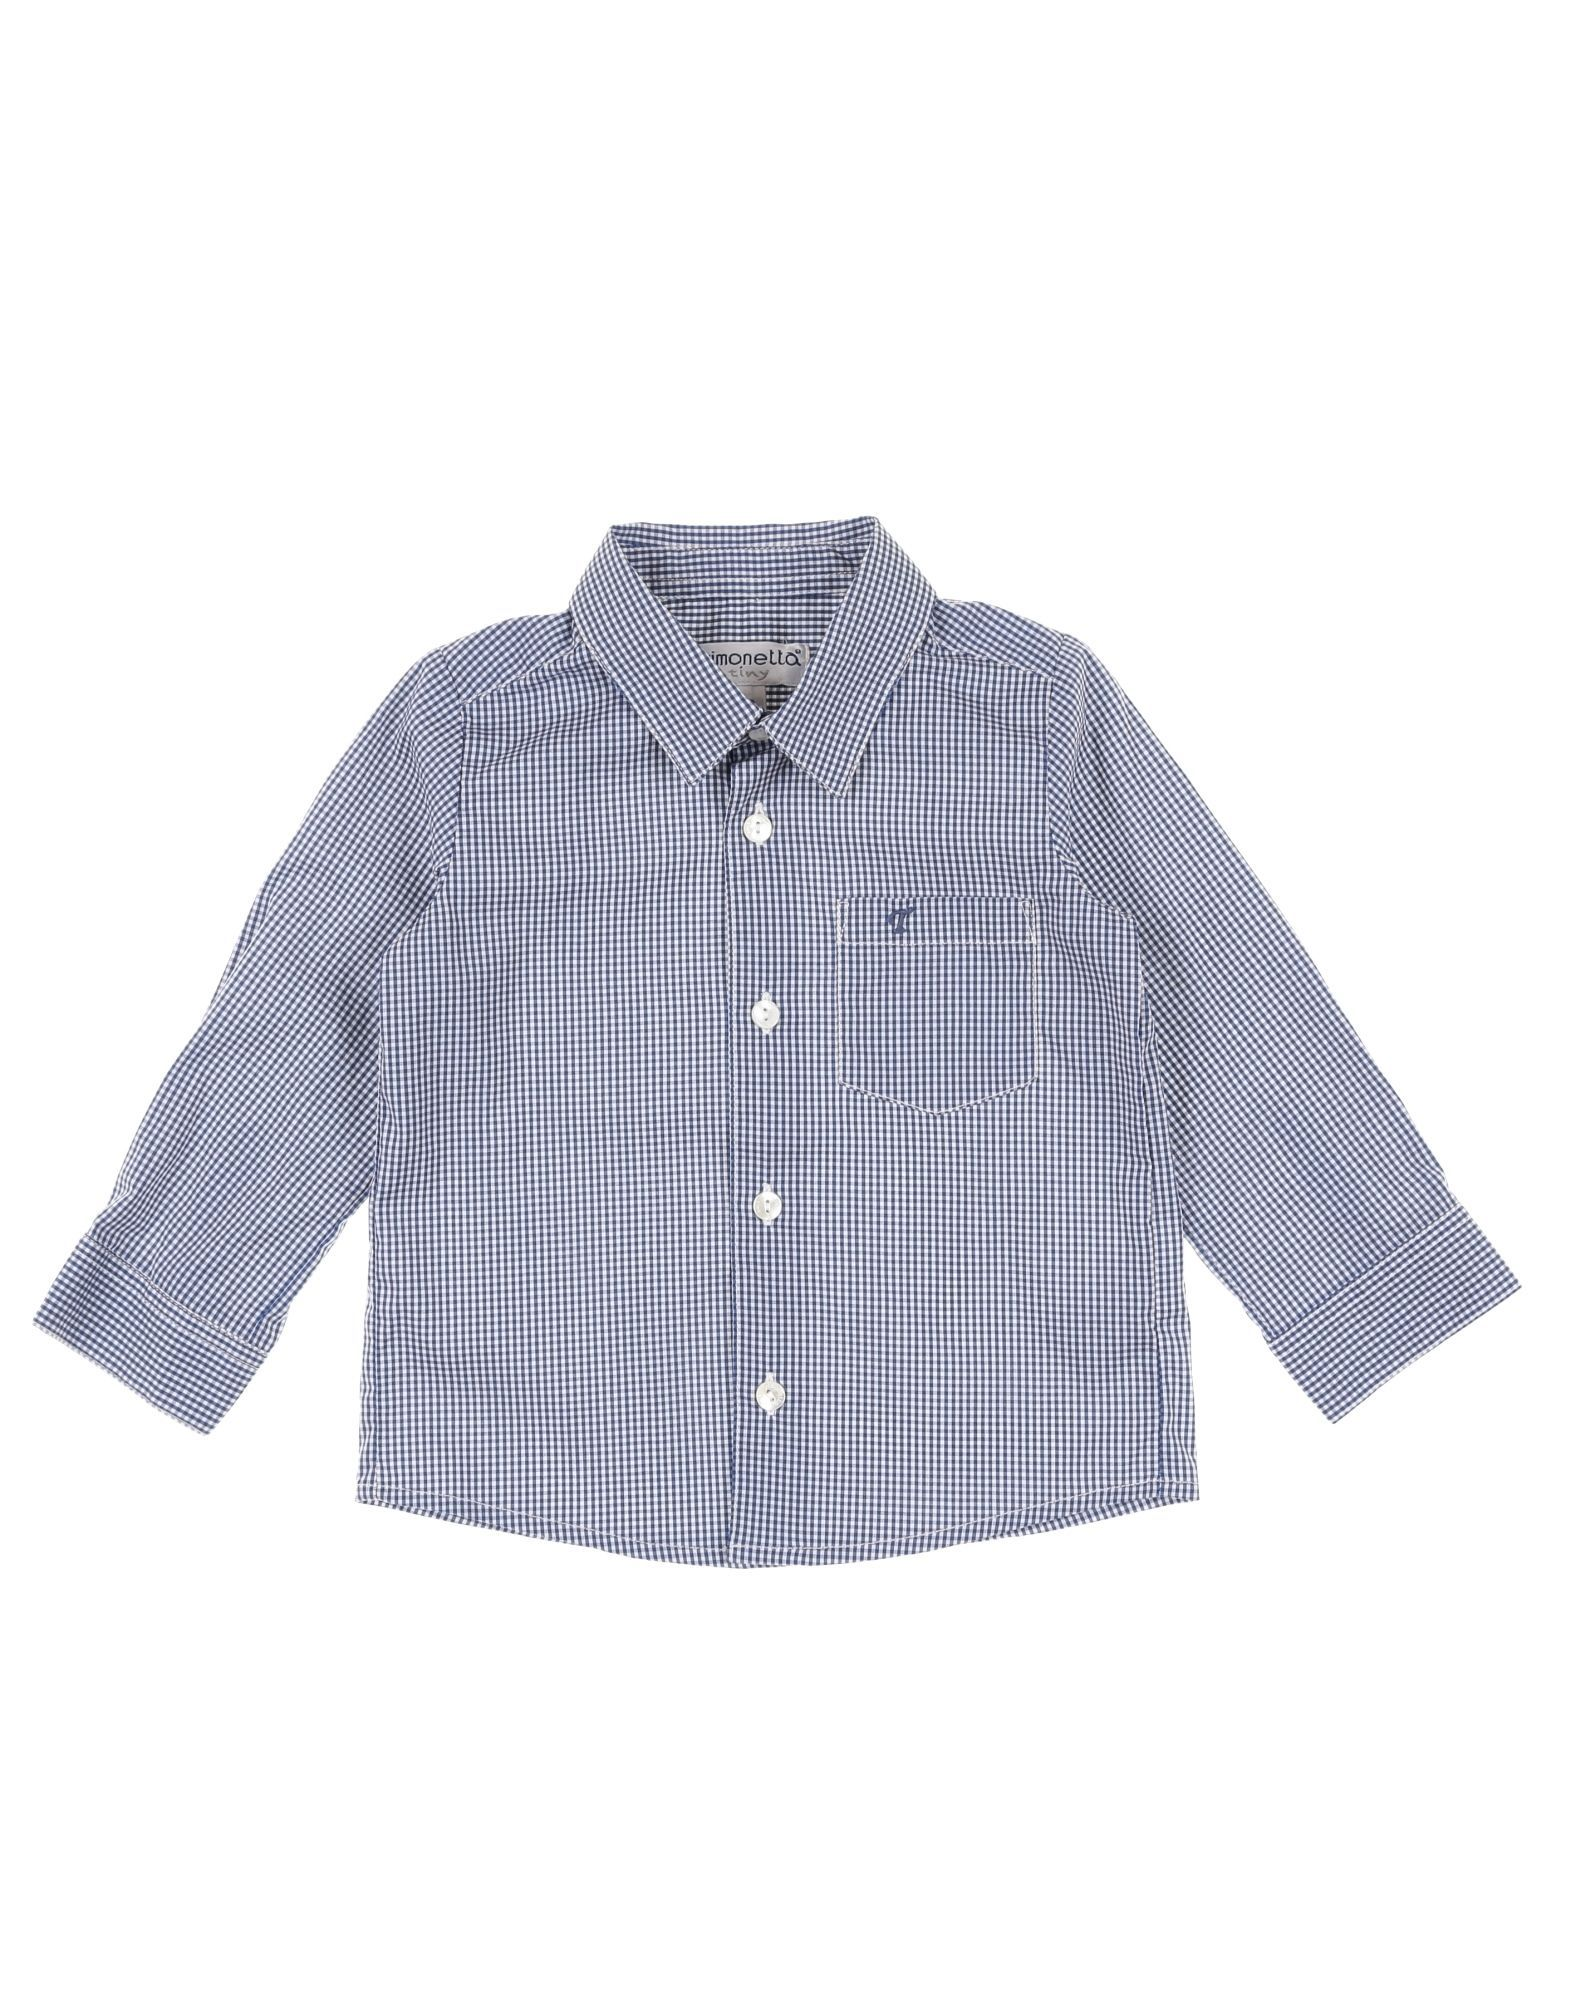 SHIRTS Simonetta Tiny Blue Boy Cotton